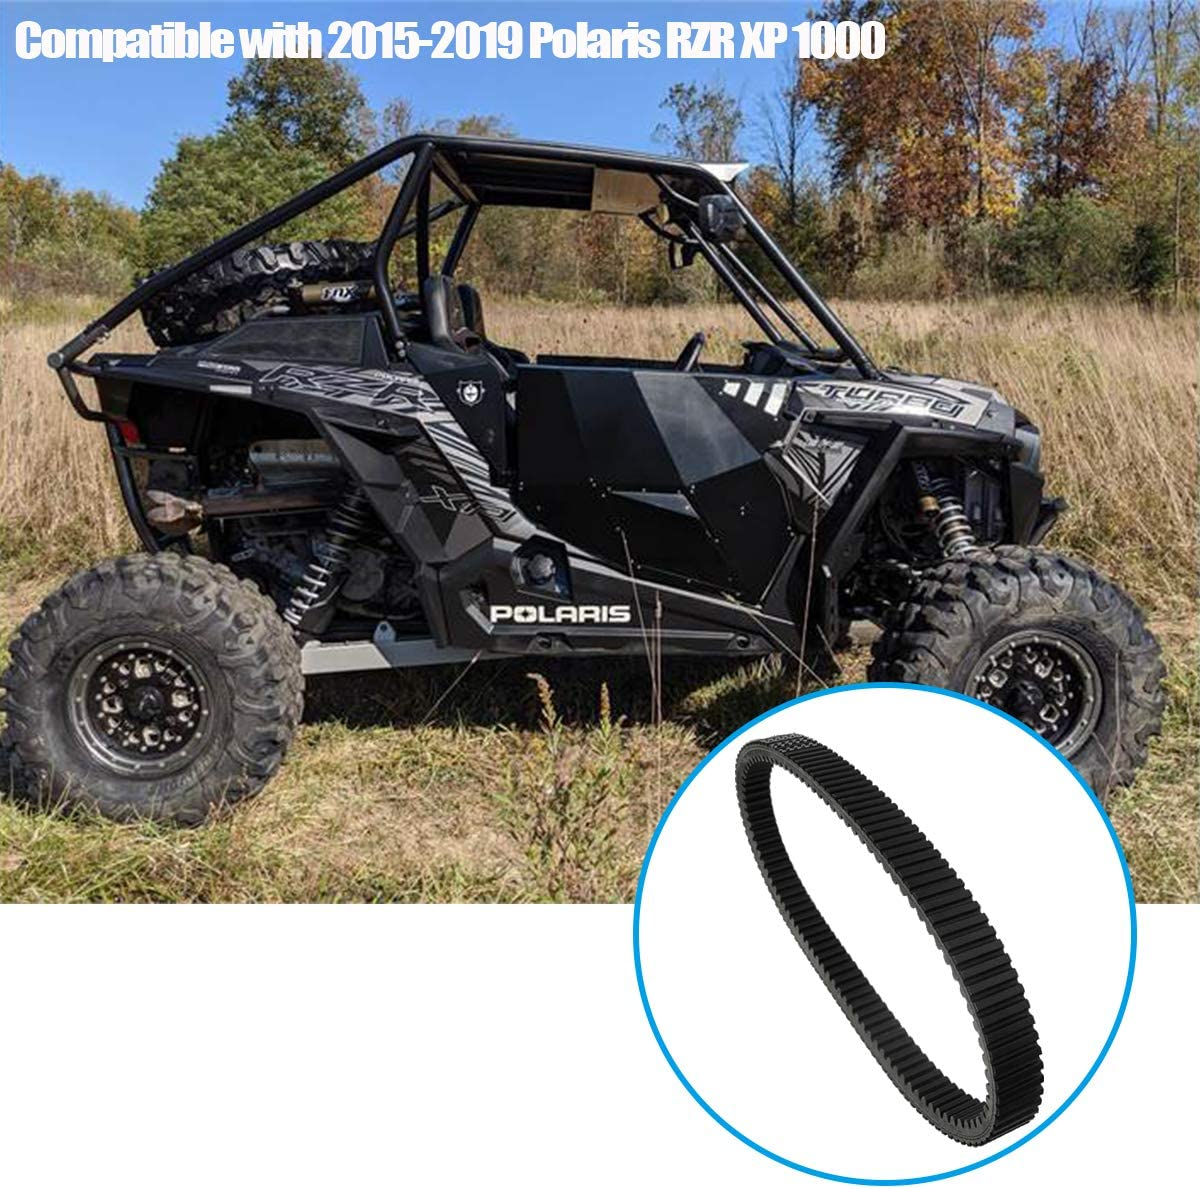 Gekufa 3211180 Drive Belt Compatible with 2015-2019 Polaris RZR XP 1000